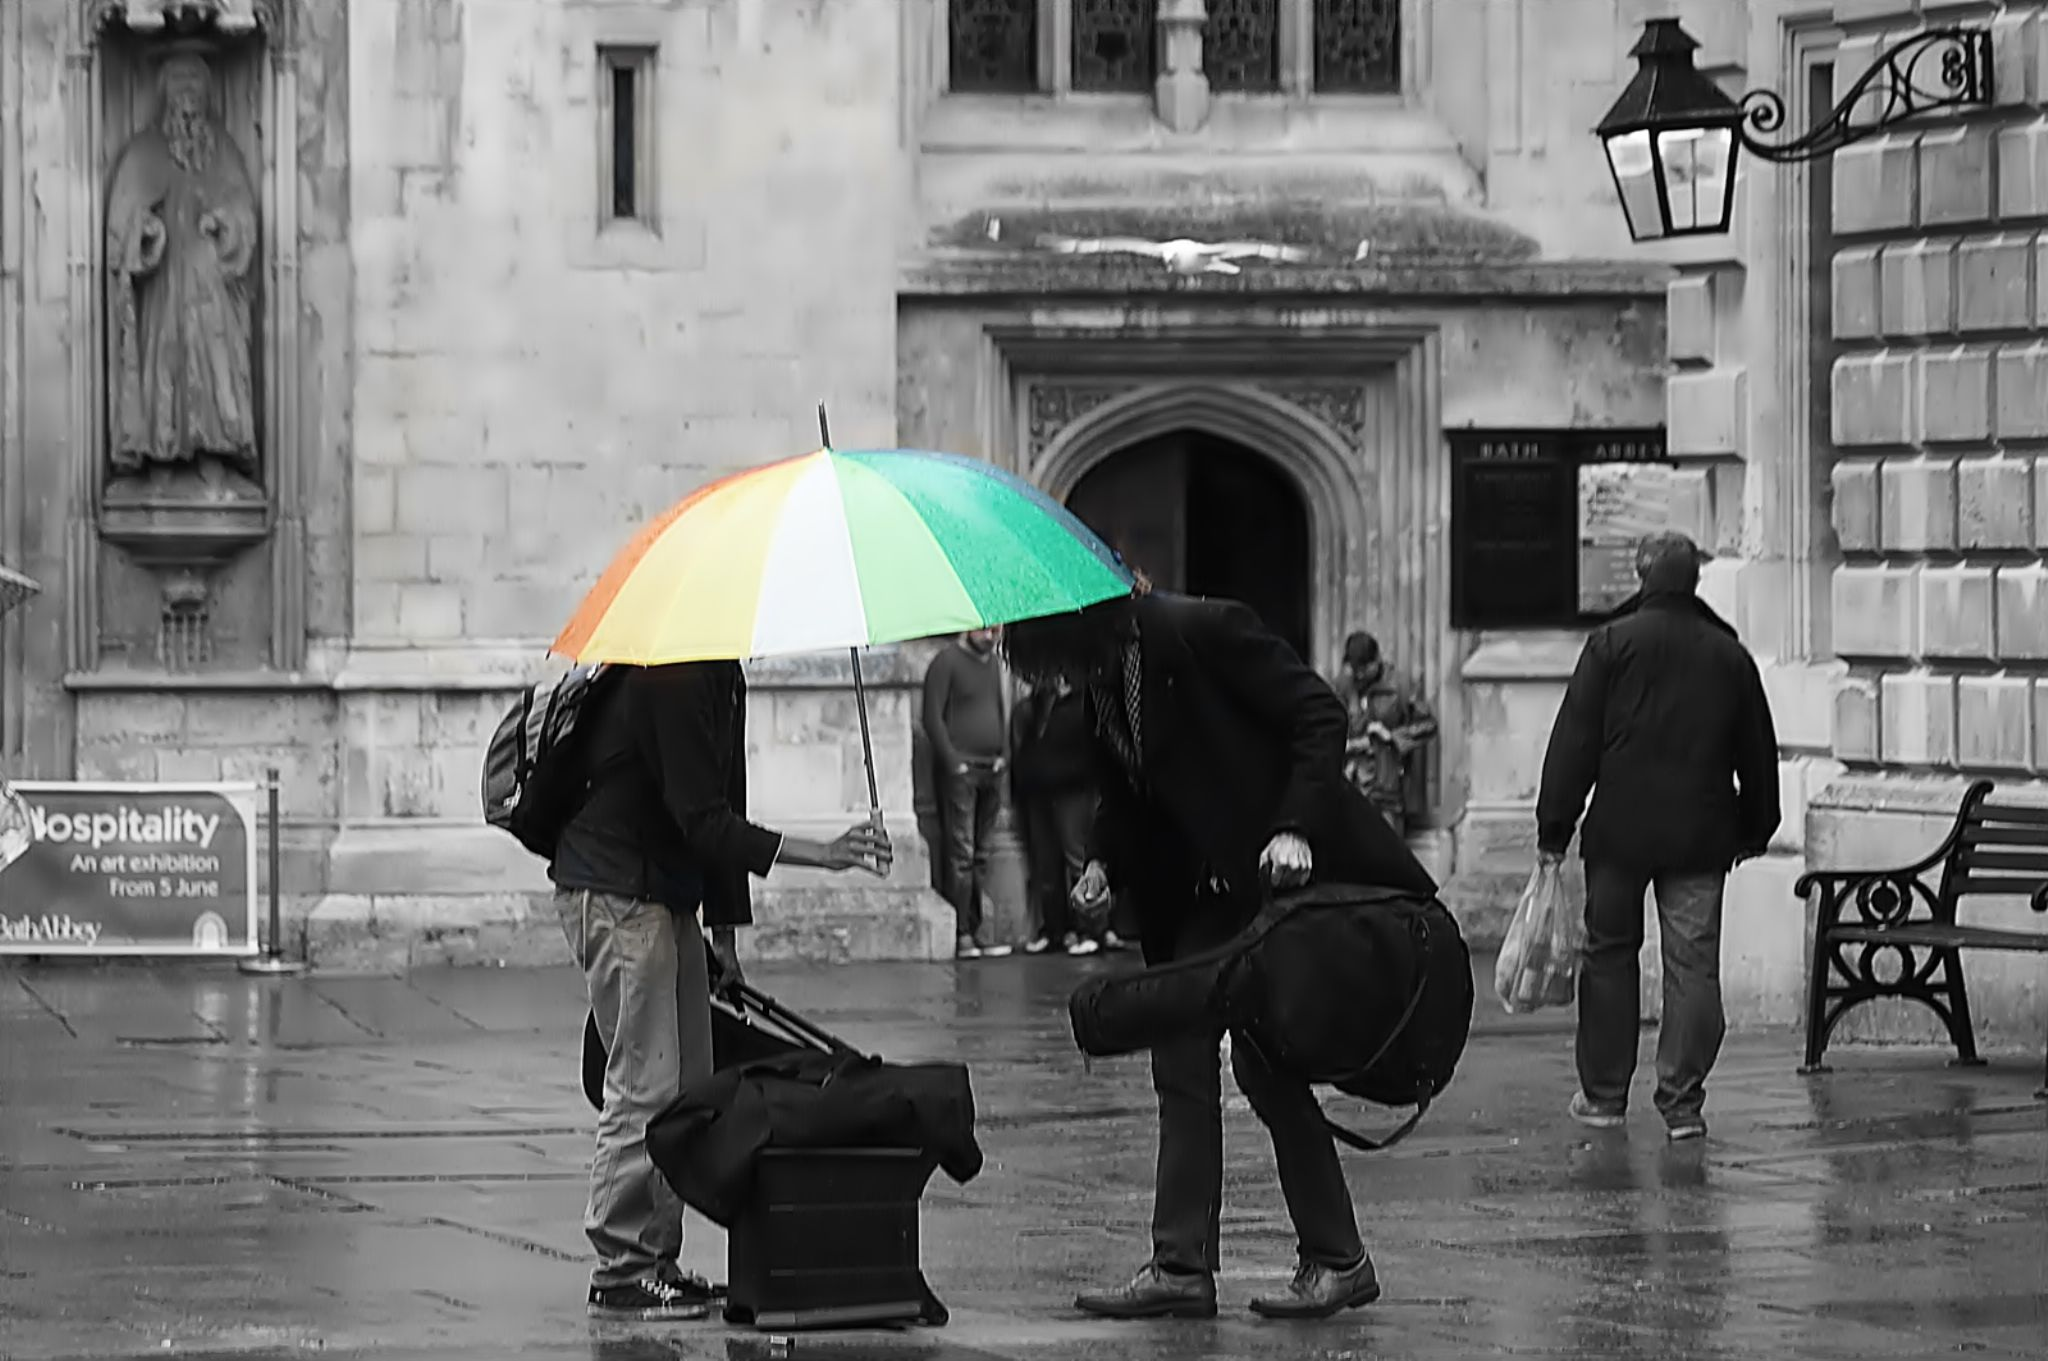 umbrella by Kamil Gaweł